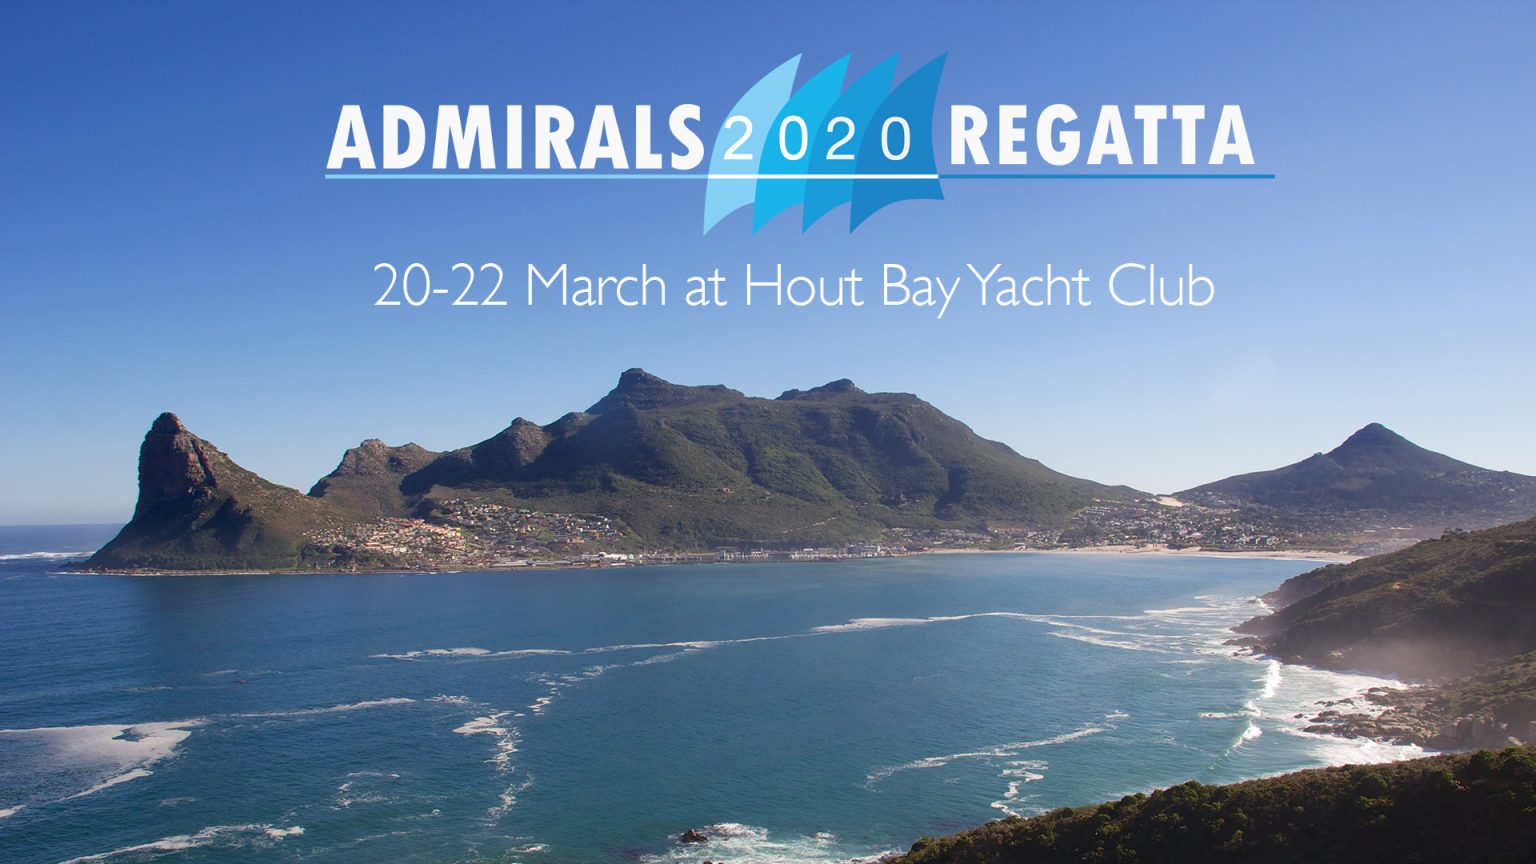 Admirals regatta